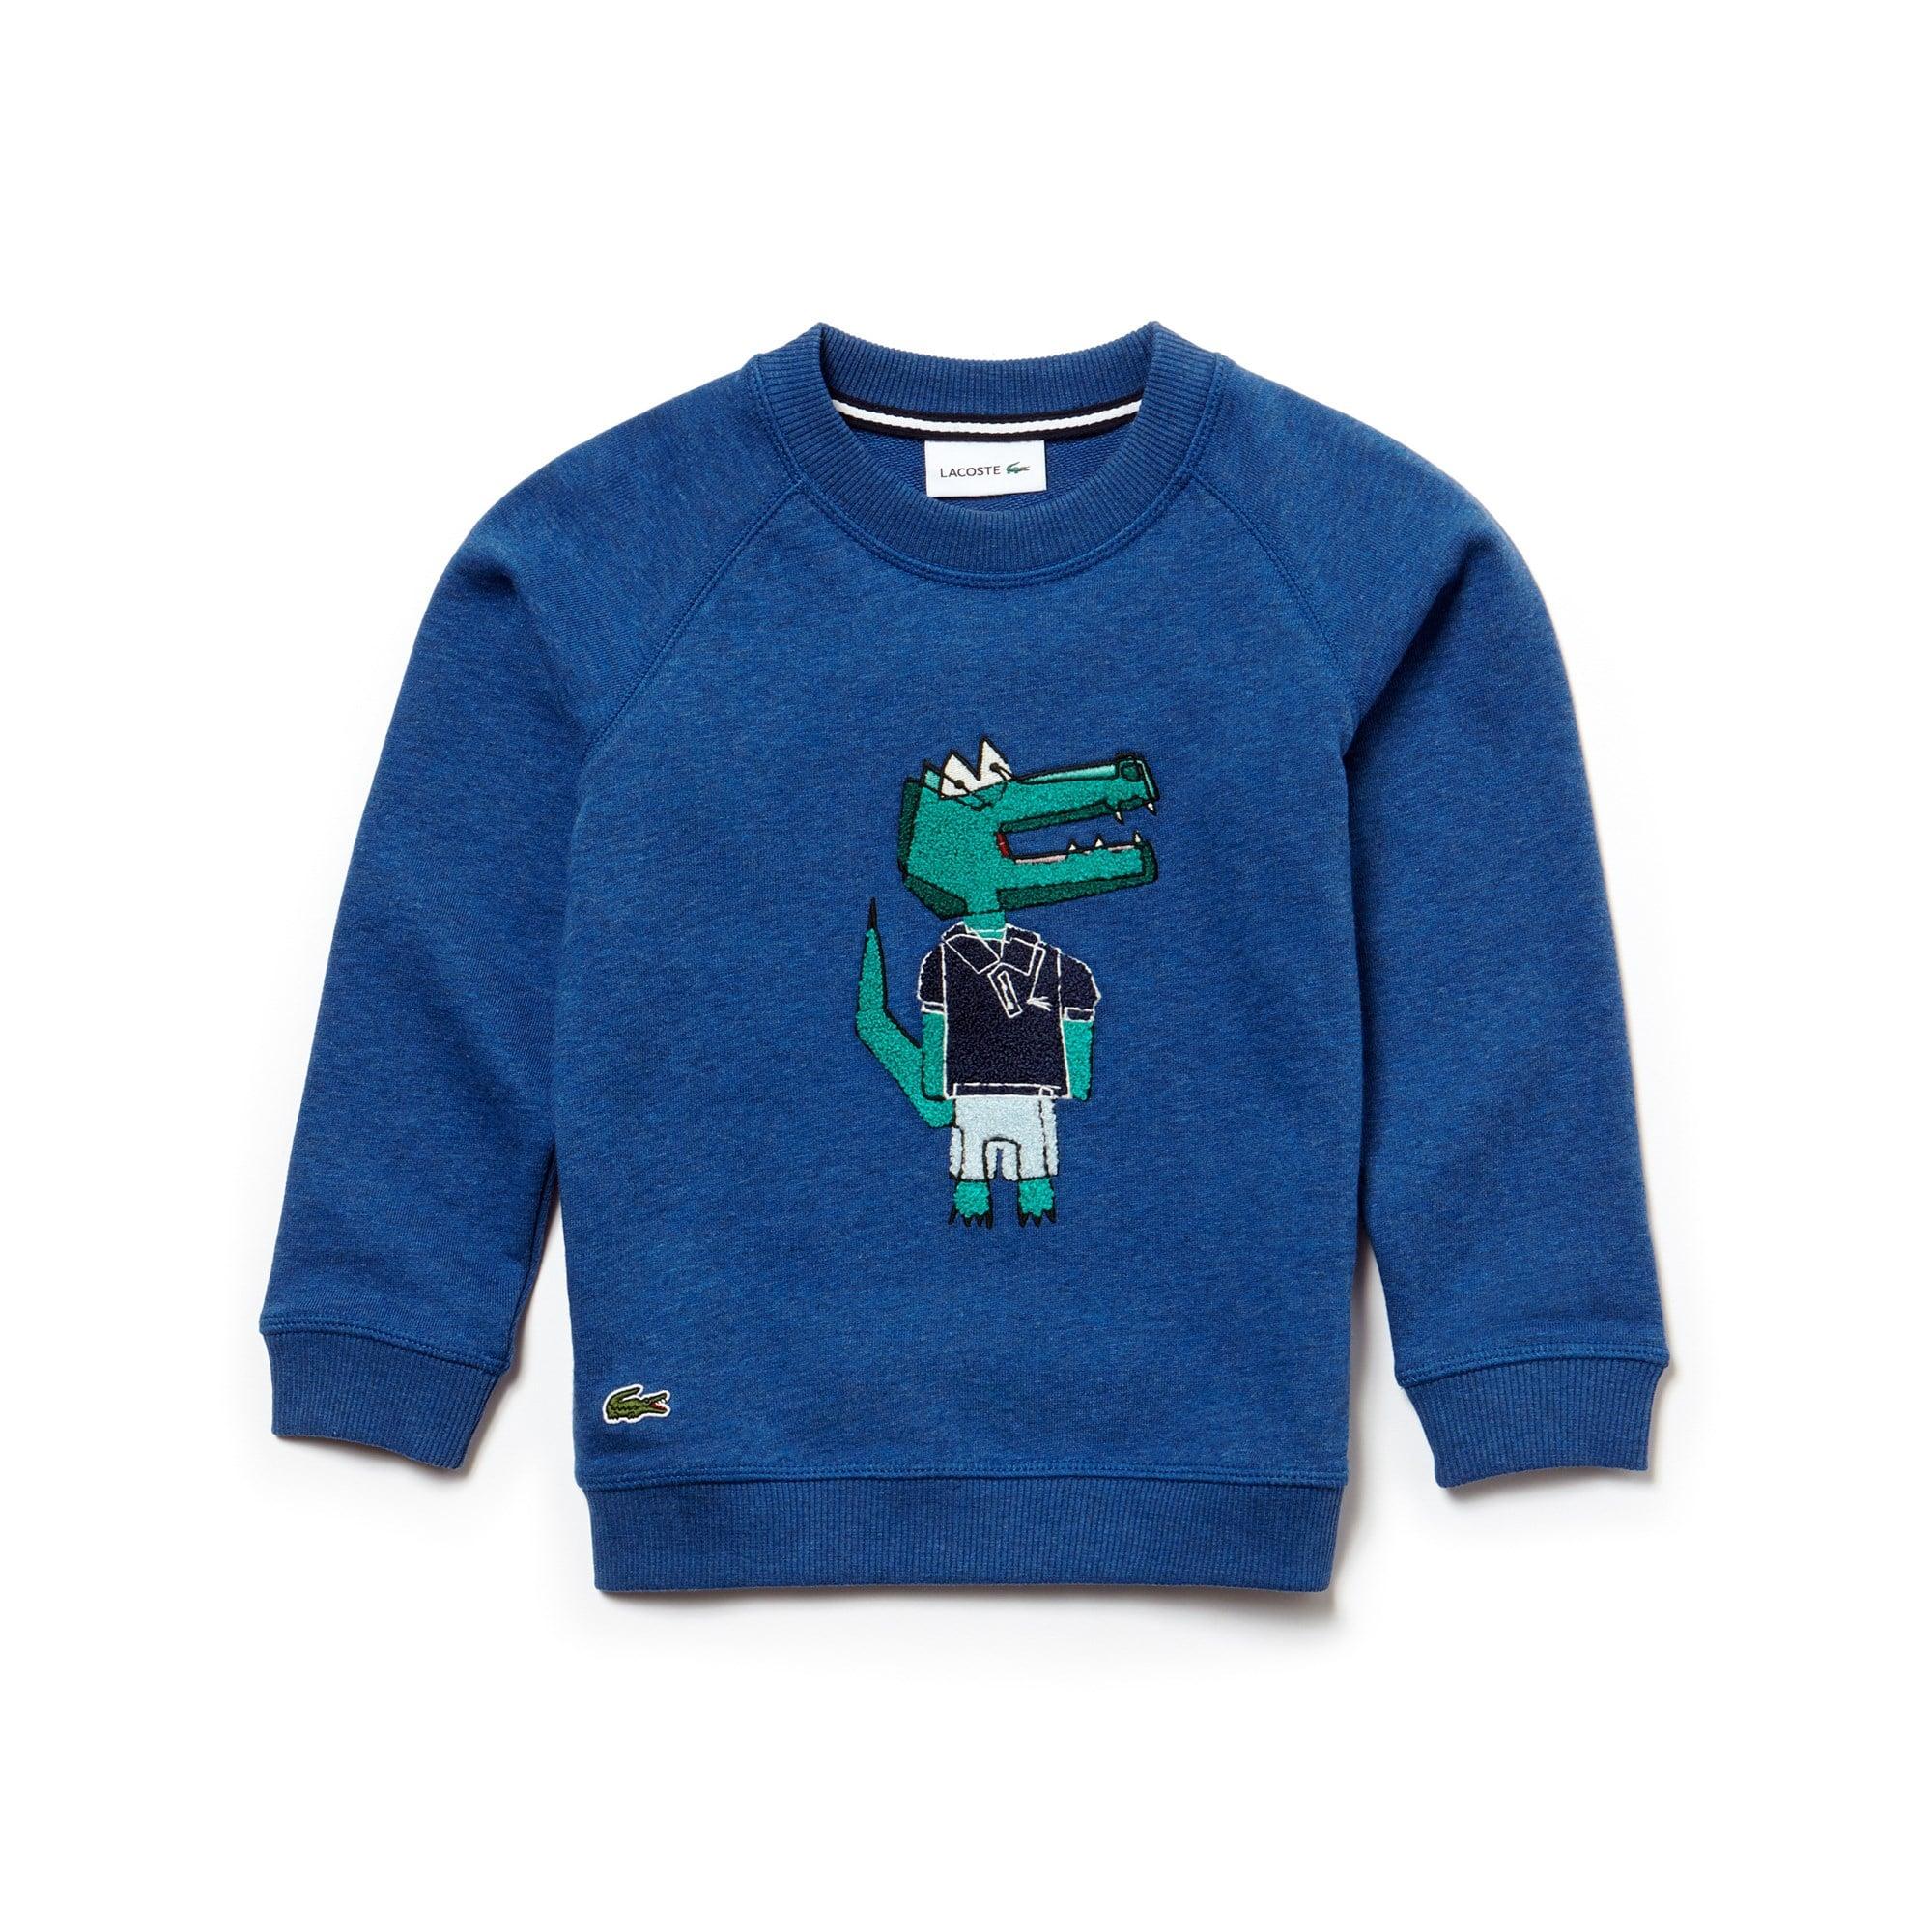 Sweatshirt col rond Garçon en molleton indigo avec crocodile